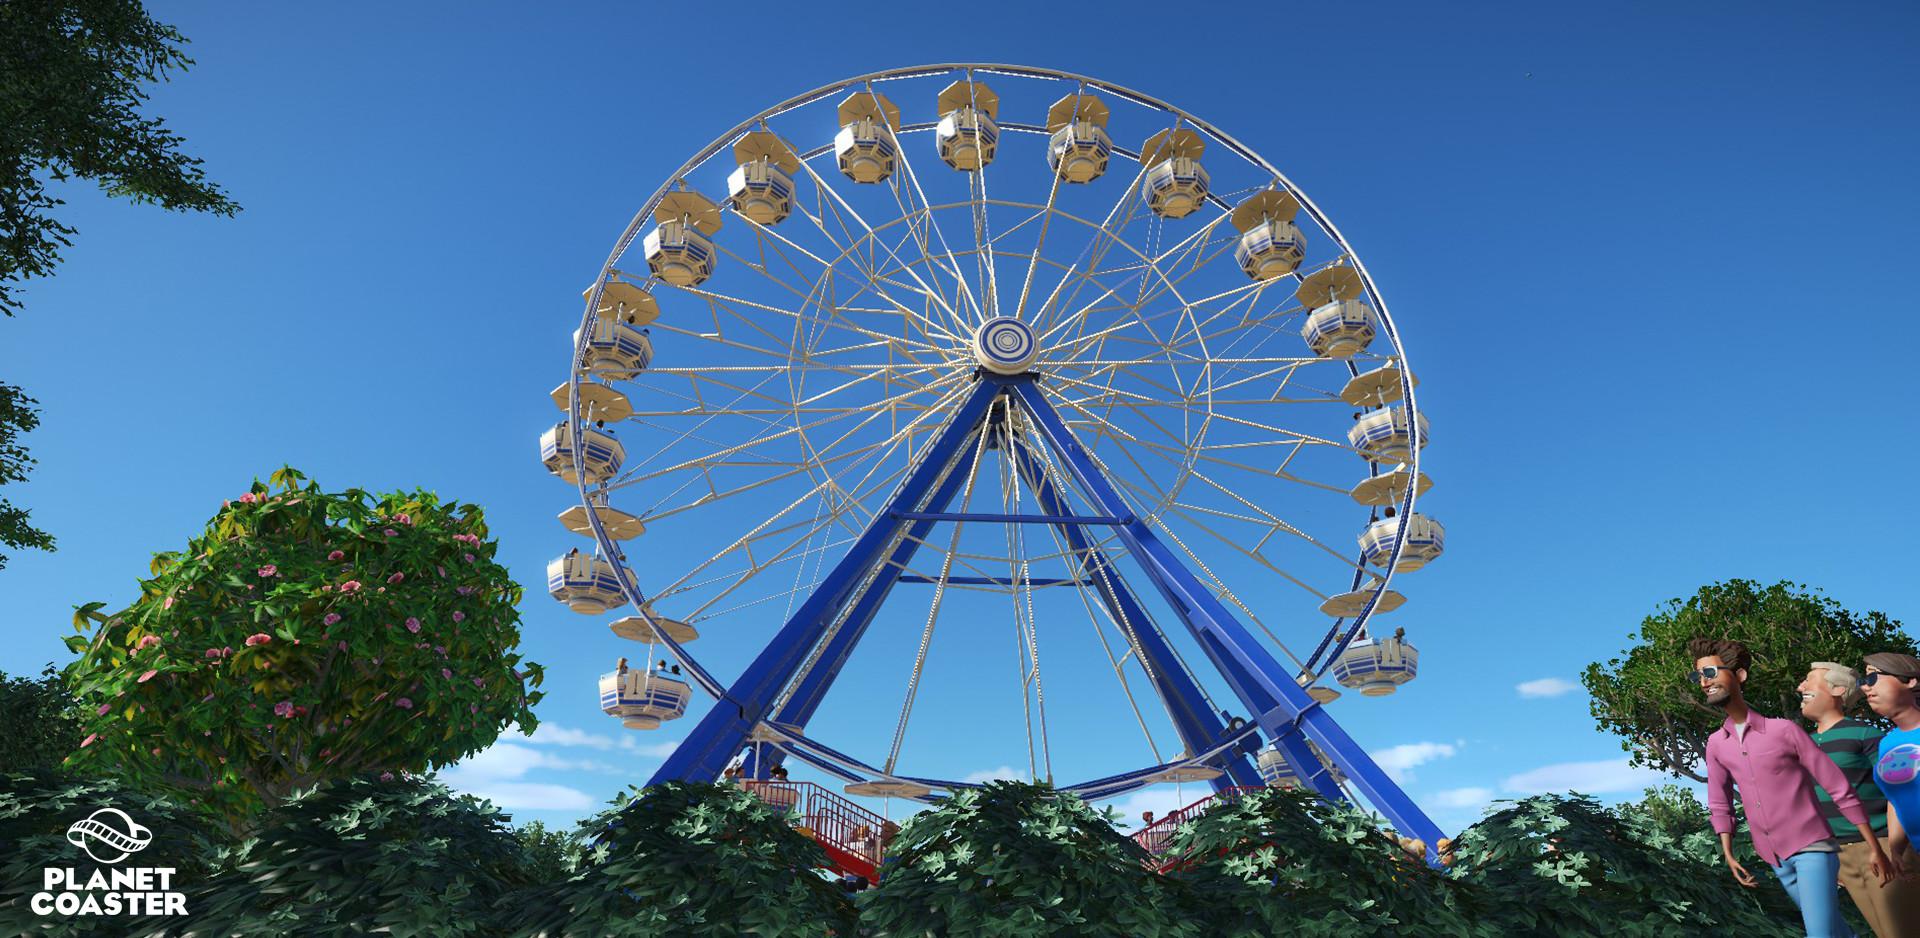 Oscar rickett wheel1